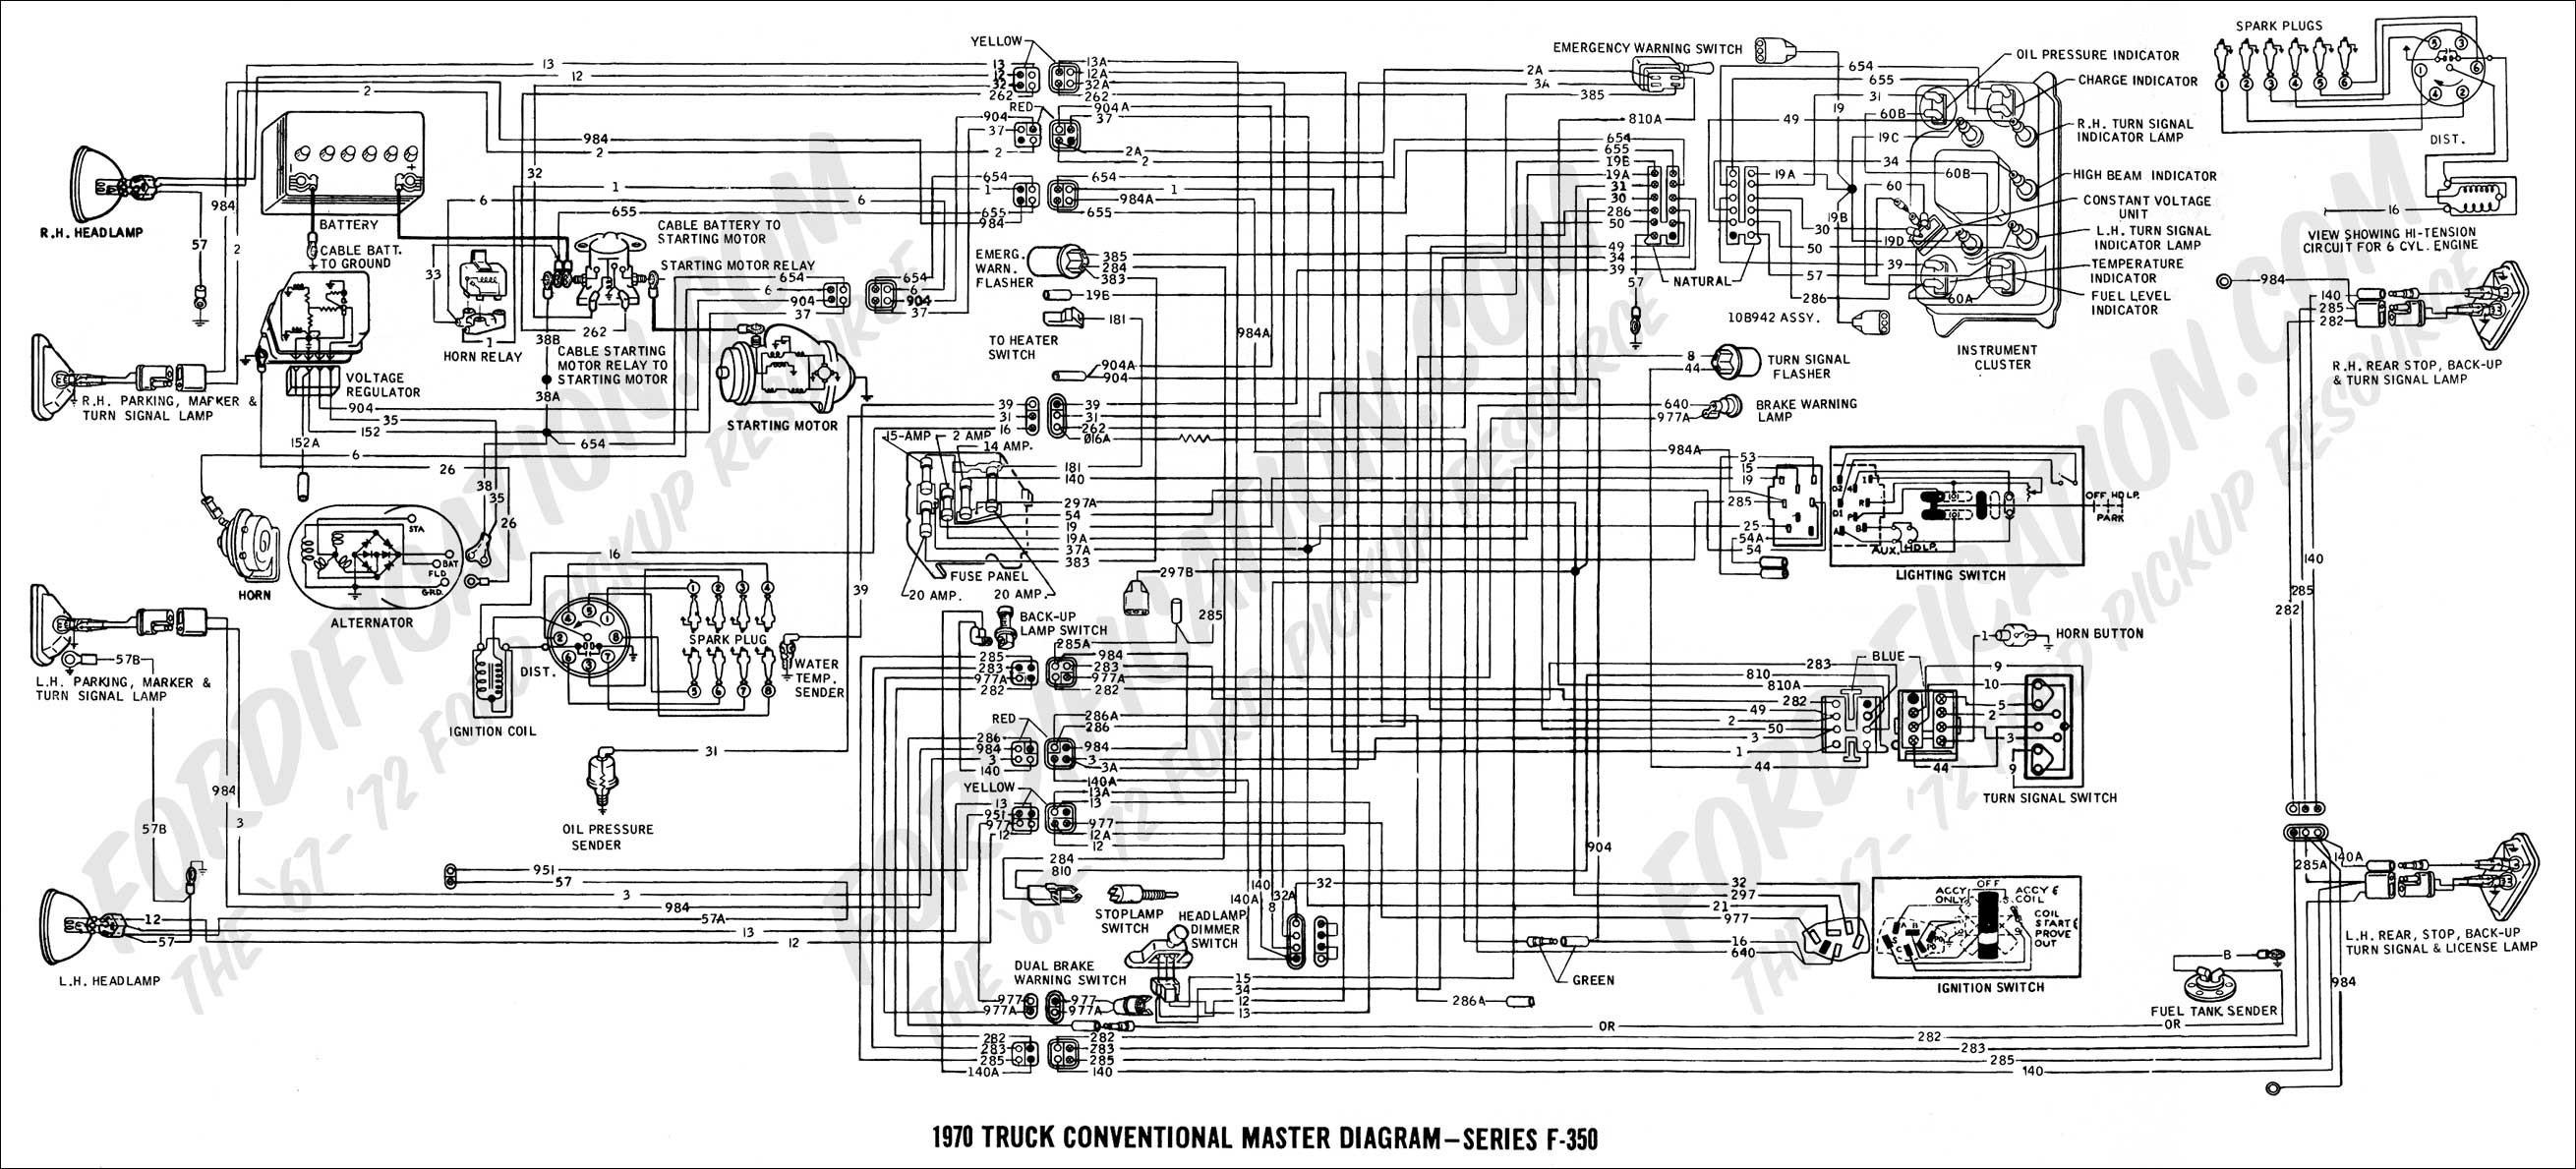 Ford 4 0 Sohc Engine Diagram - Wiring Diagram Forward  Liter Ford Engine Diagram on jeep wrangler engine diagram, ford 4.6 liter engine diagram, 2005 ford mustang 4.0 engine diagram, 4.0 liter ford engine problems, 5.4 liter ford engine diagram, 1997 ford 4.0 engine diagram, volvo engine diagram, 2.9 liter ford engine diagram, sohc engine diagram, 3.8 liter ford engine diagram, 2001 ford 4.0 engine diagram, jeep 4.0 engine diagram,